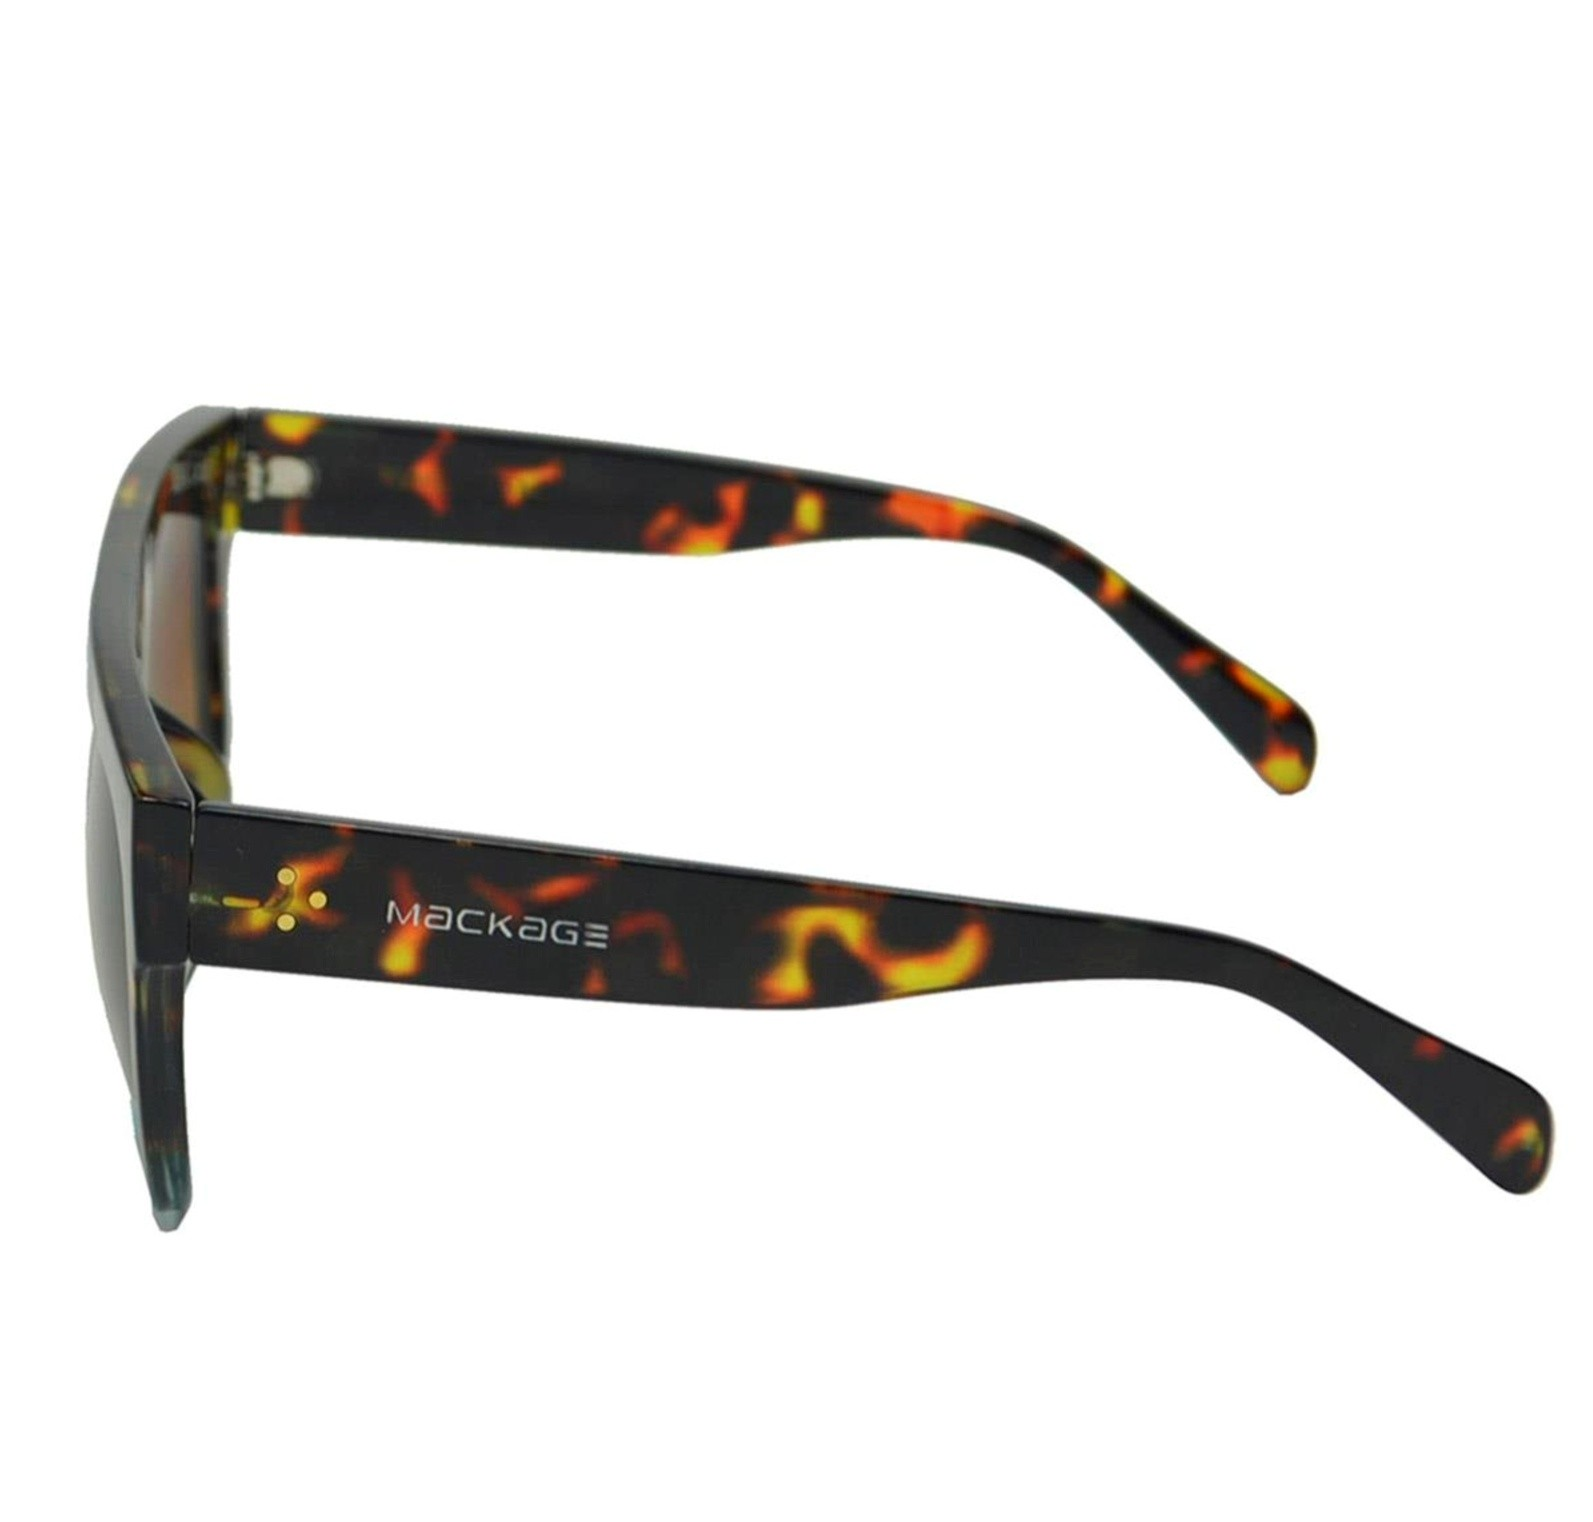 Óculos De Sol Mackage Unissex Acetato Fashion - Tarta